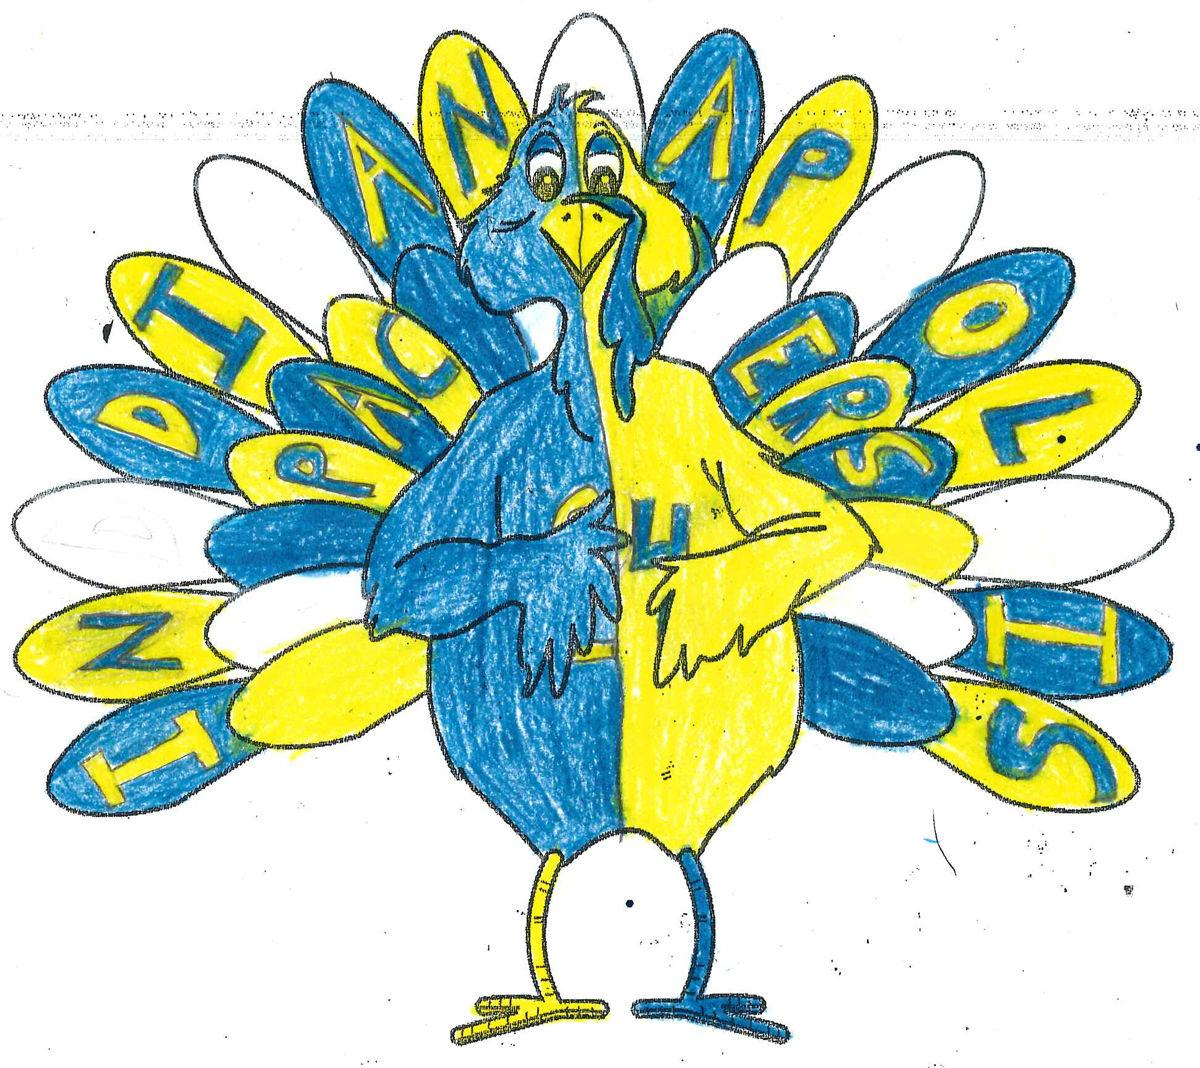 2015 Prize Turkeys Gallery 1 | News | kokomotribune.com